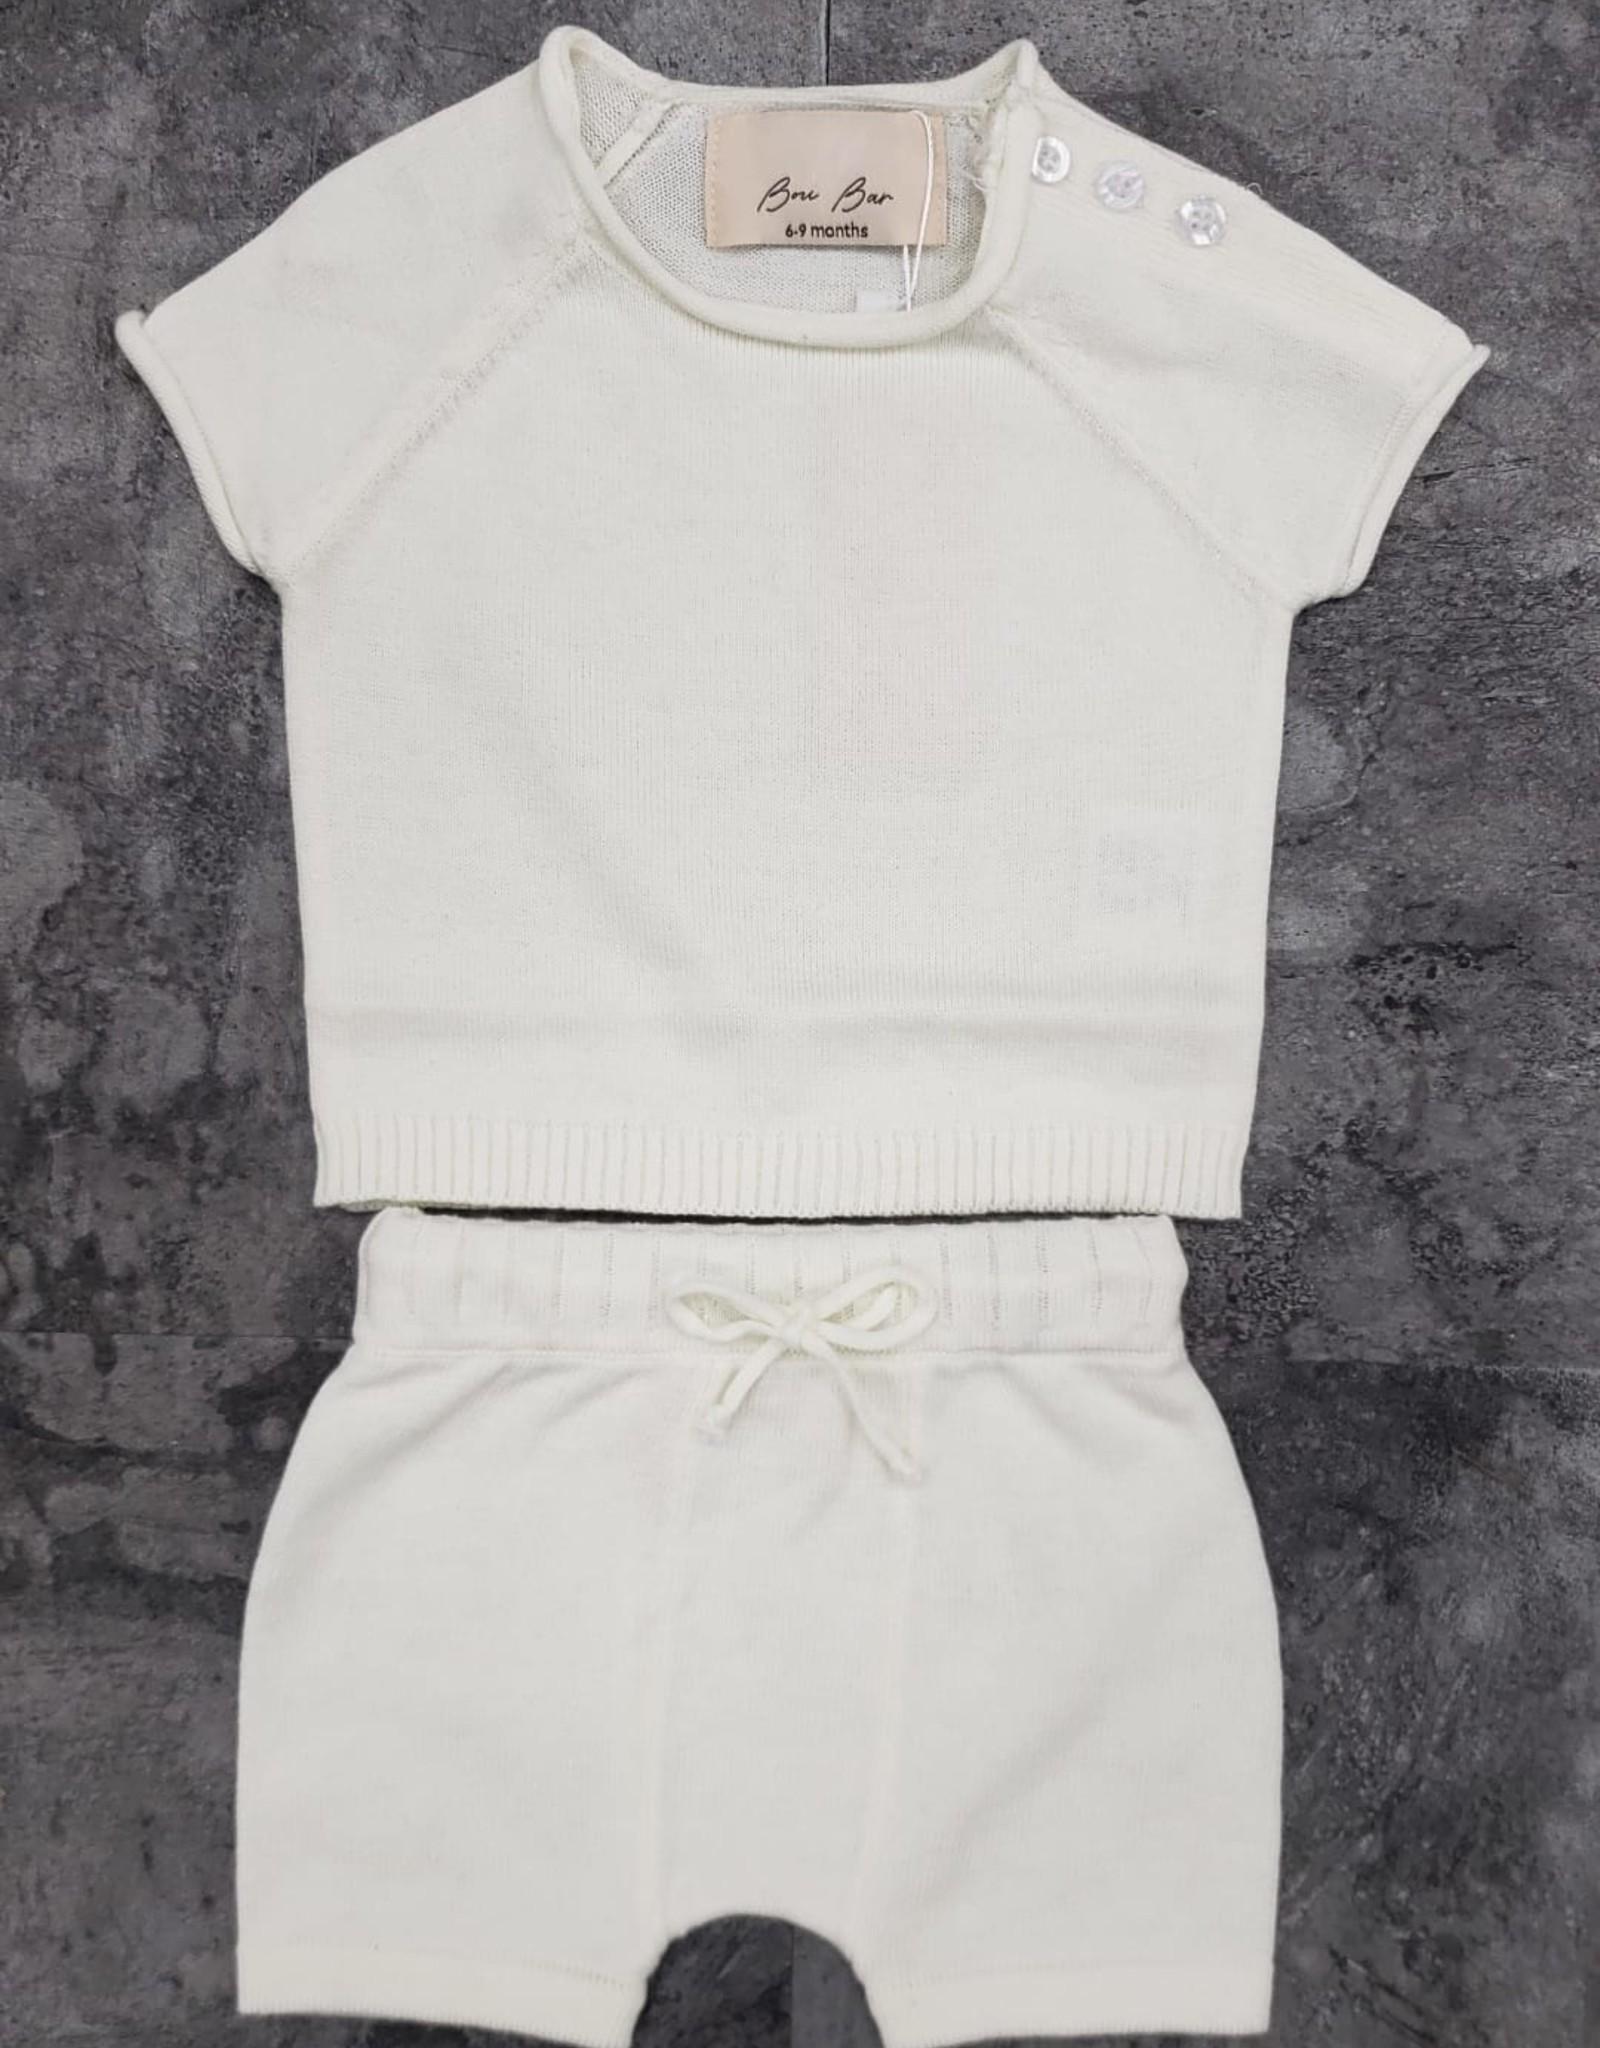 Bou Bar Bou Bar Shorts/Short Sleeve Knit Set